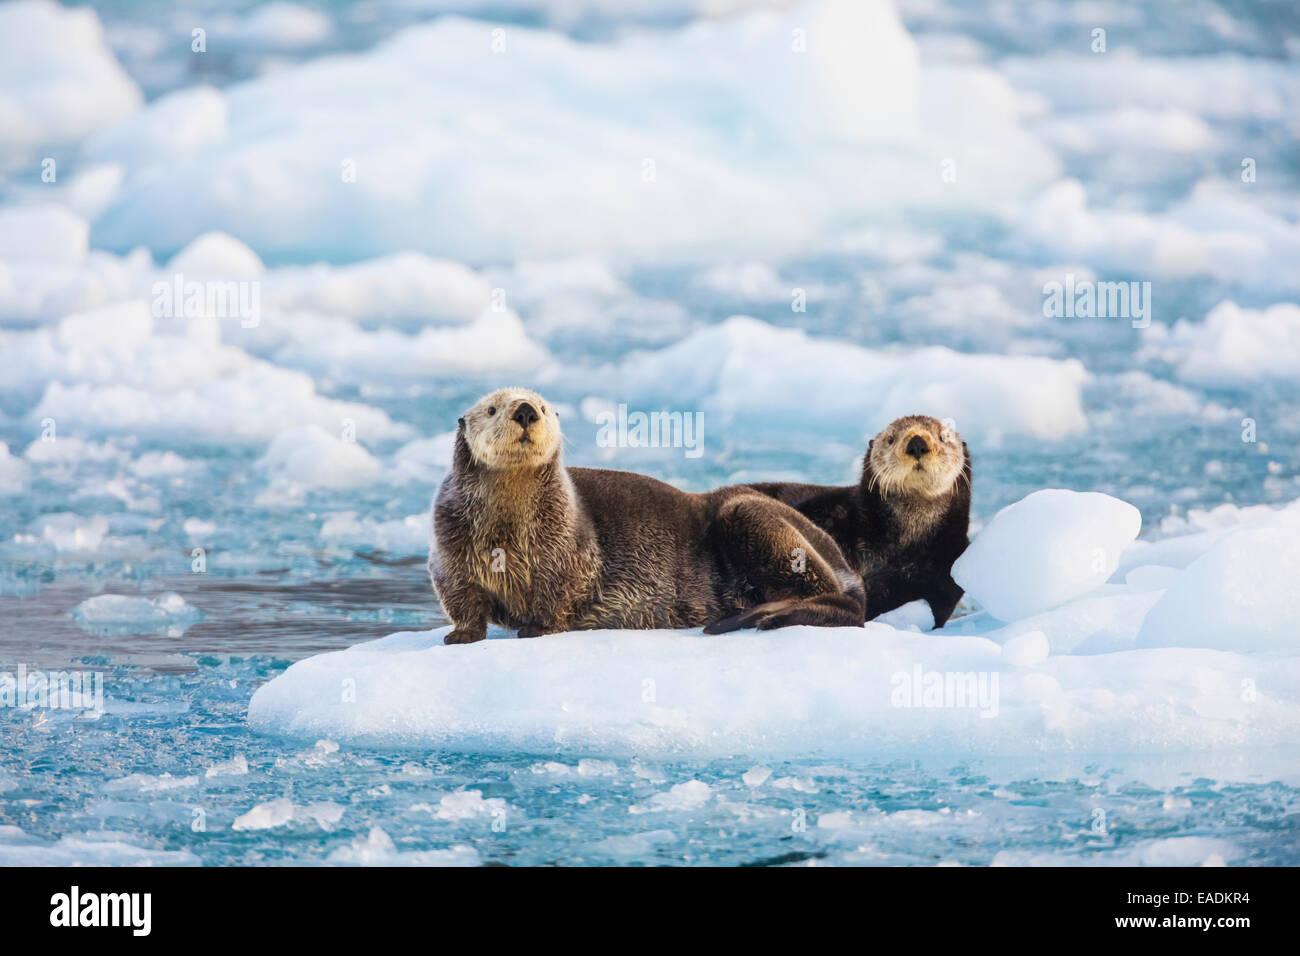 Sea otters in glacier ice, northern Prince William Sound, Alaska. - Stock Image